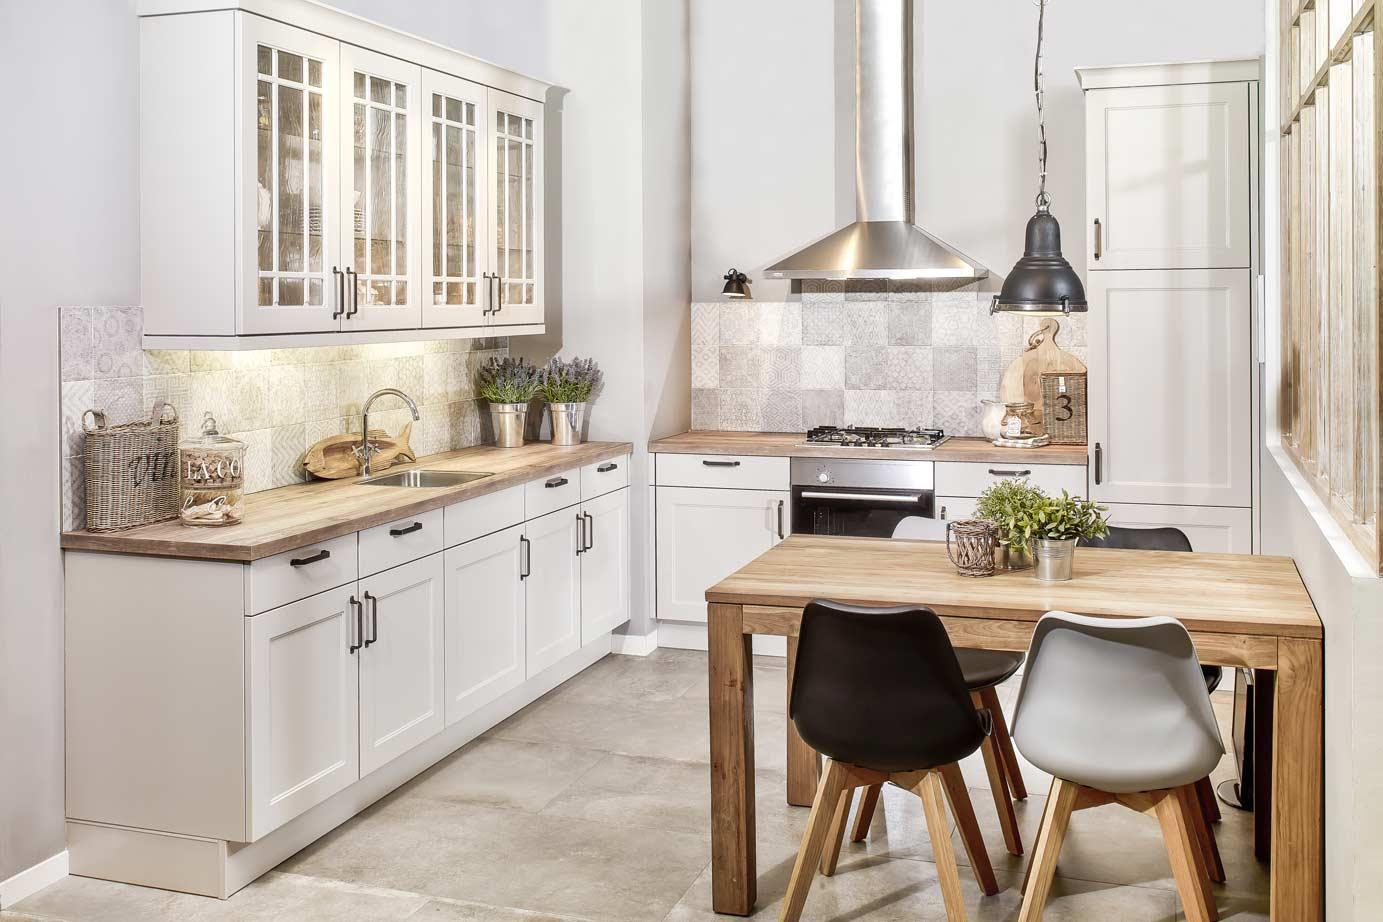 Keur Keukens Keukentegels : Goedkope landelijke keuken met vitrinekastjes db keukens